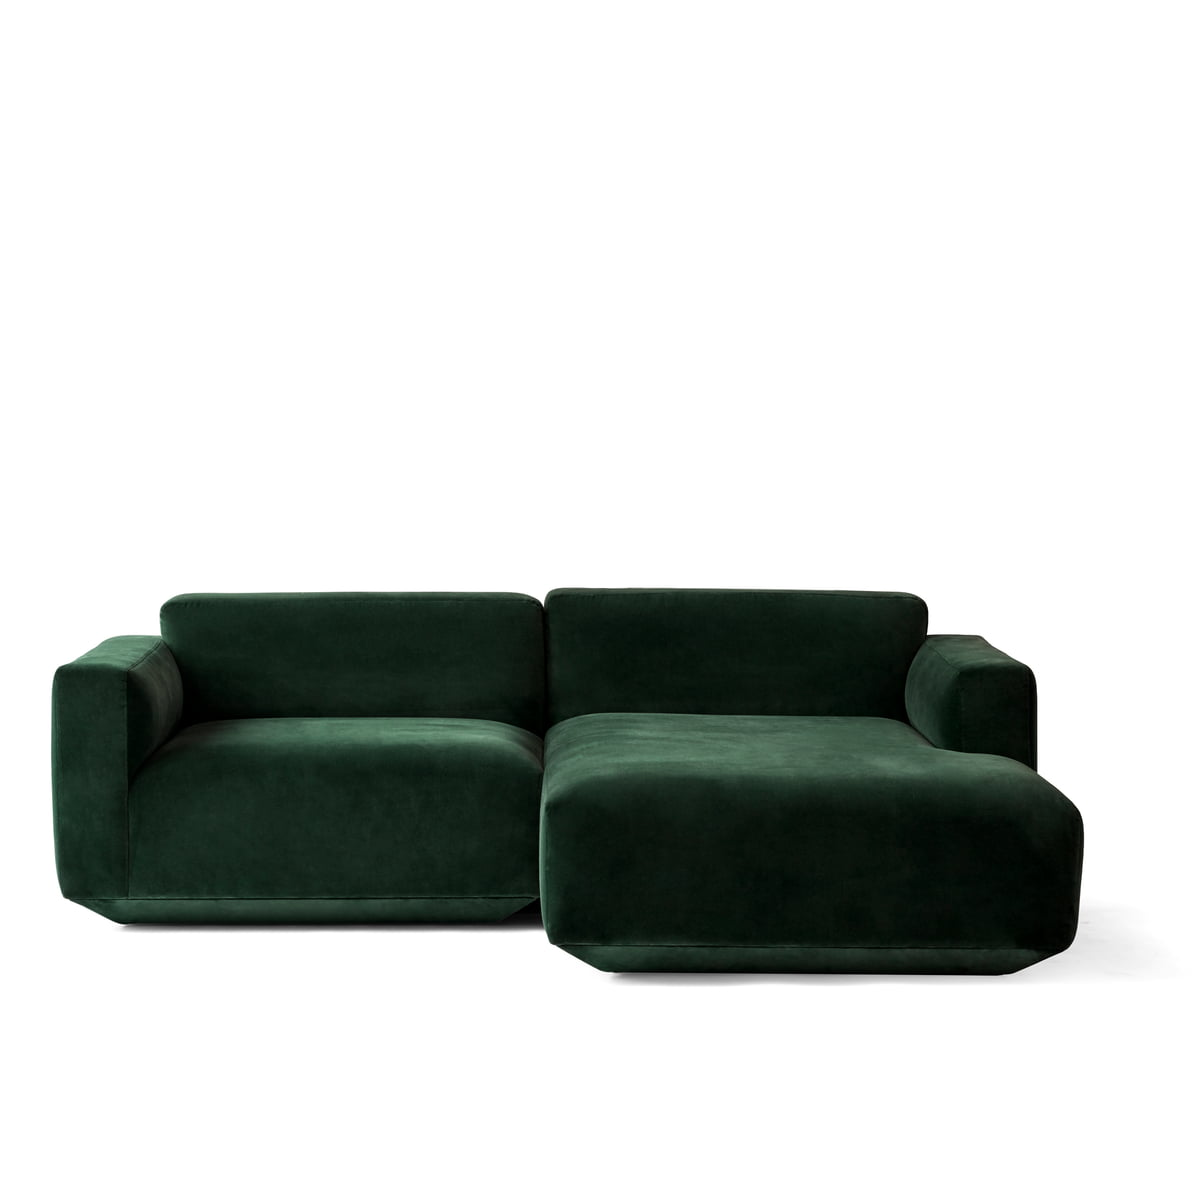 Develius Corner Sofa By Tradition Connox